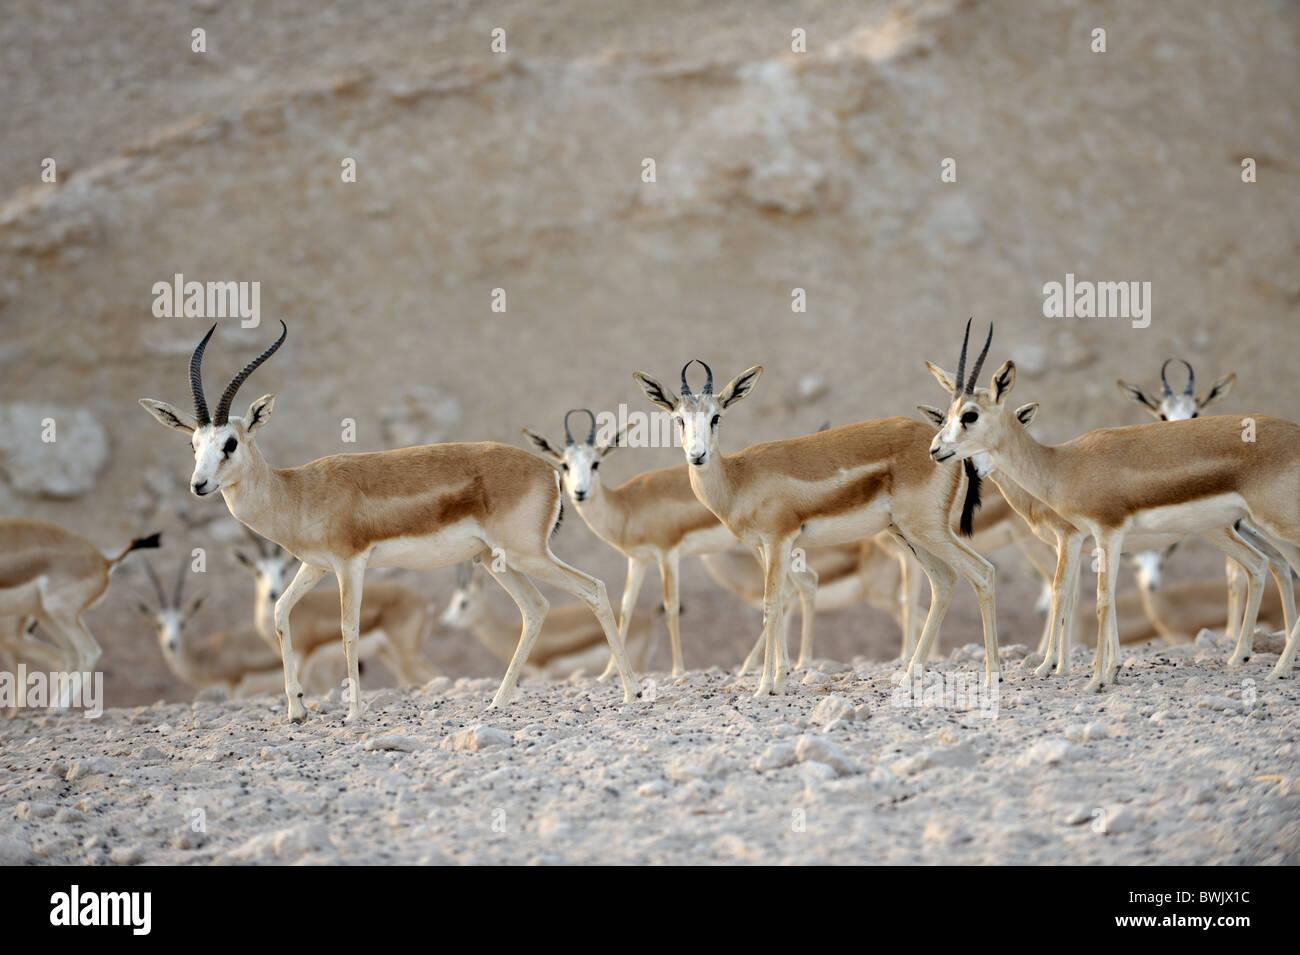 Sand gazelles (Gazella subgutturosa marica) on Sir Bani Yas Island Wildlife Reserve, Abu Dhabi - Stock Image